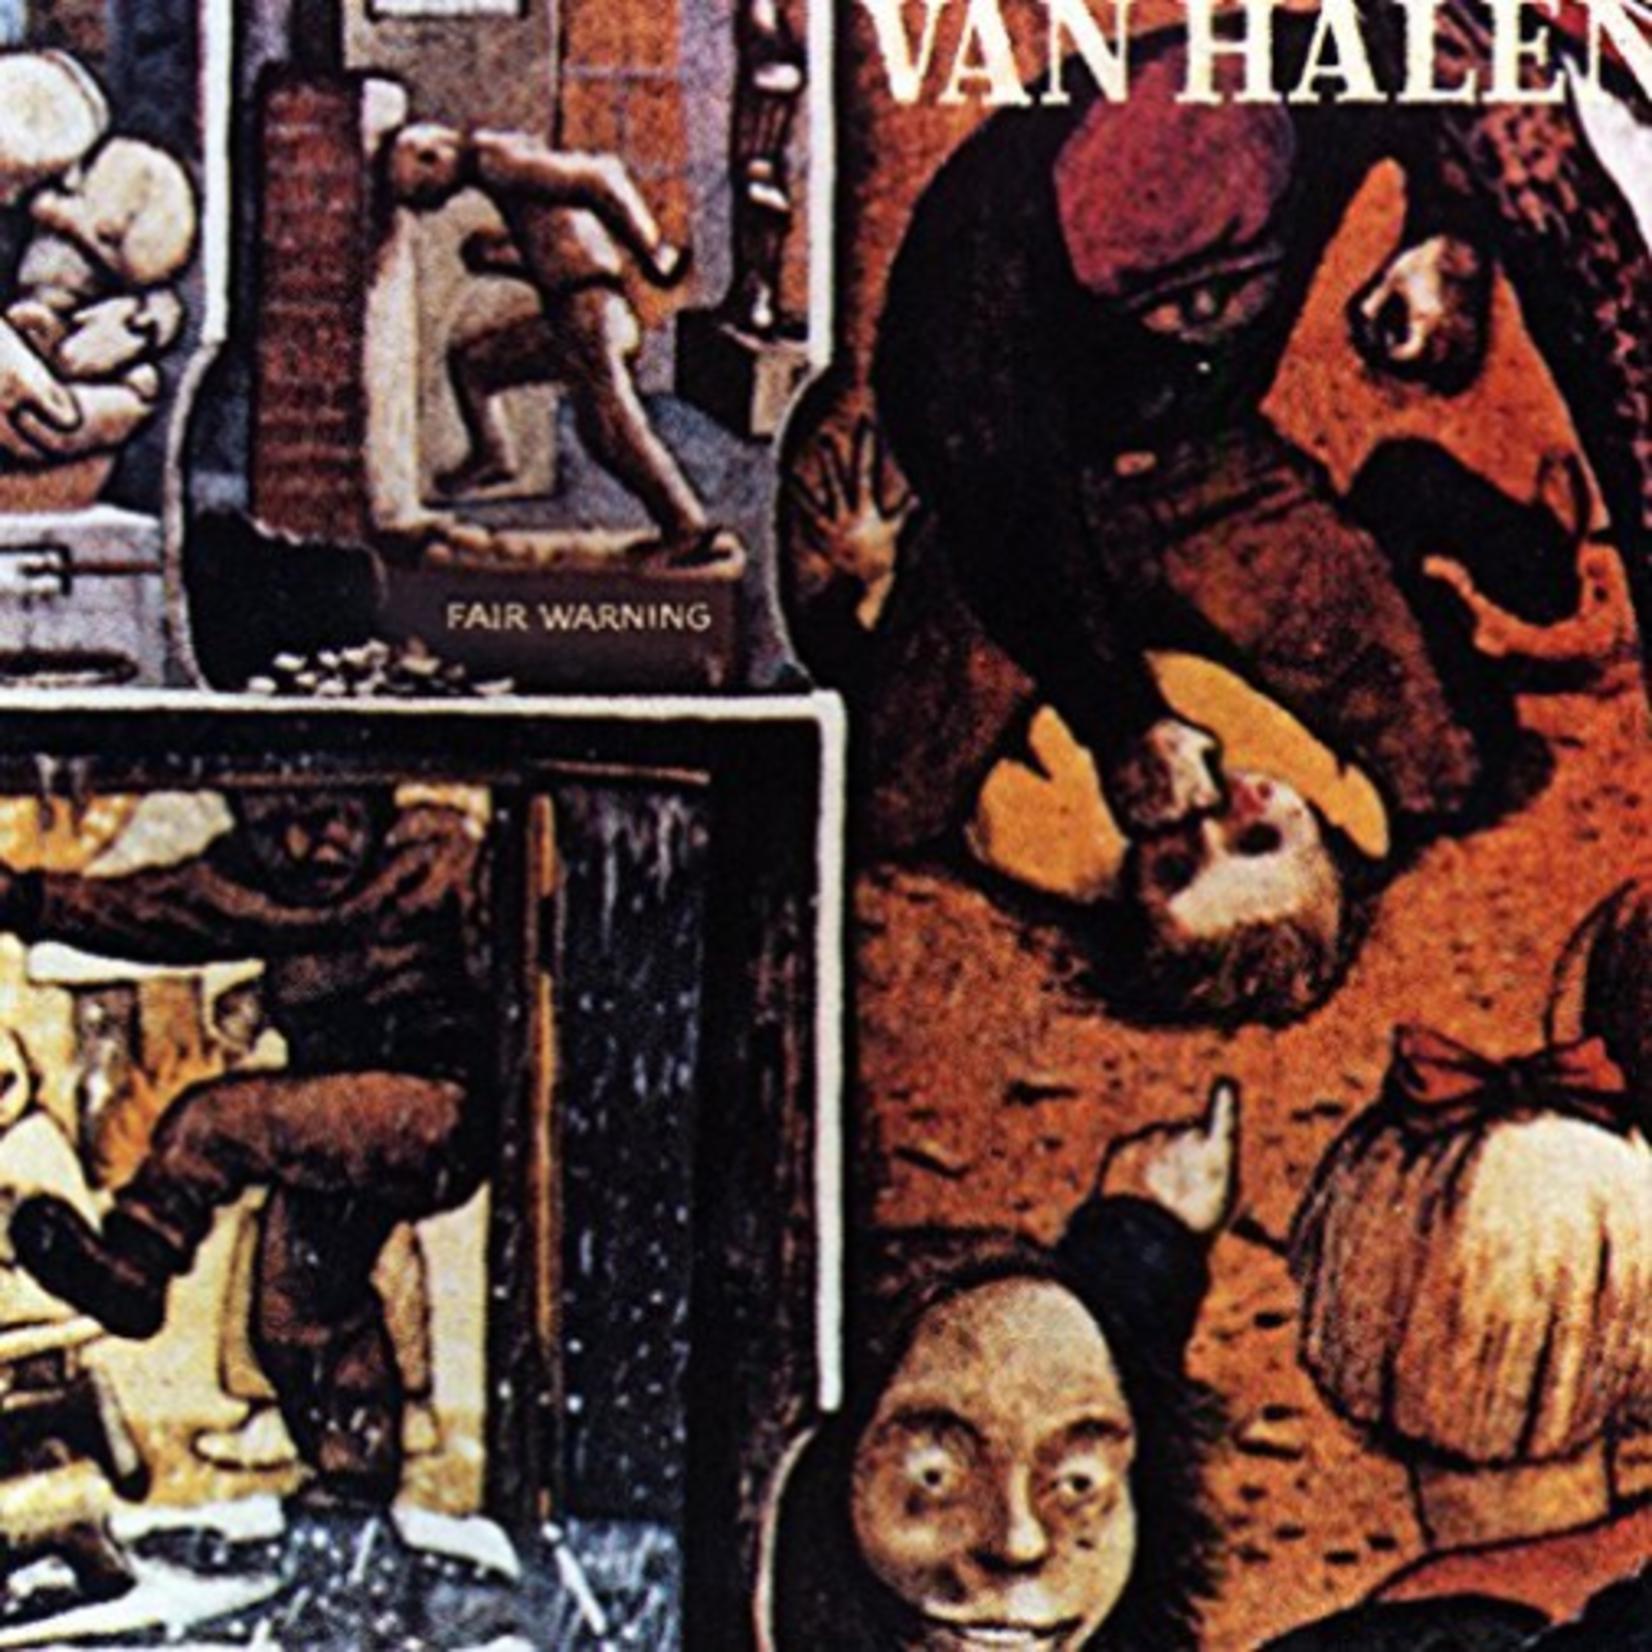 VAN HALEN FAIR WARNING (REMASTERED) (LP)